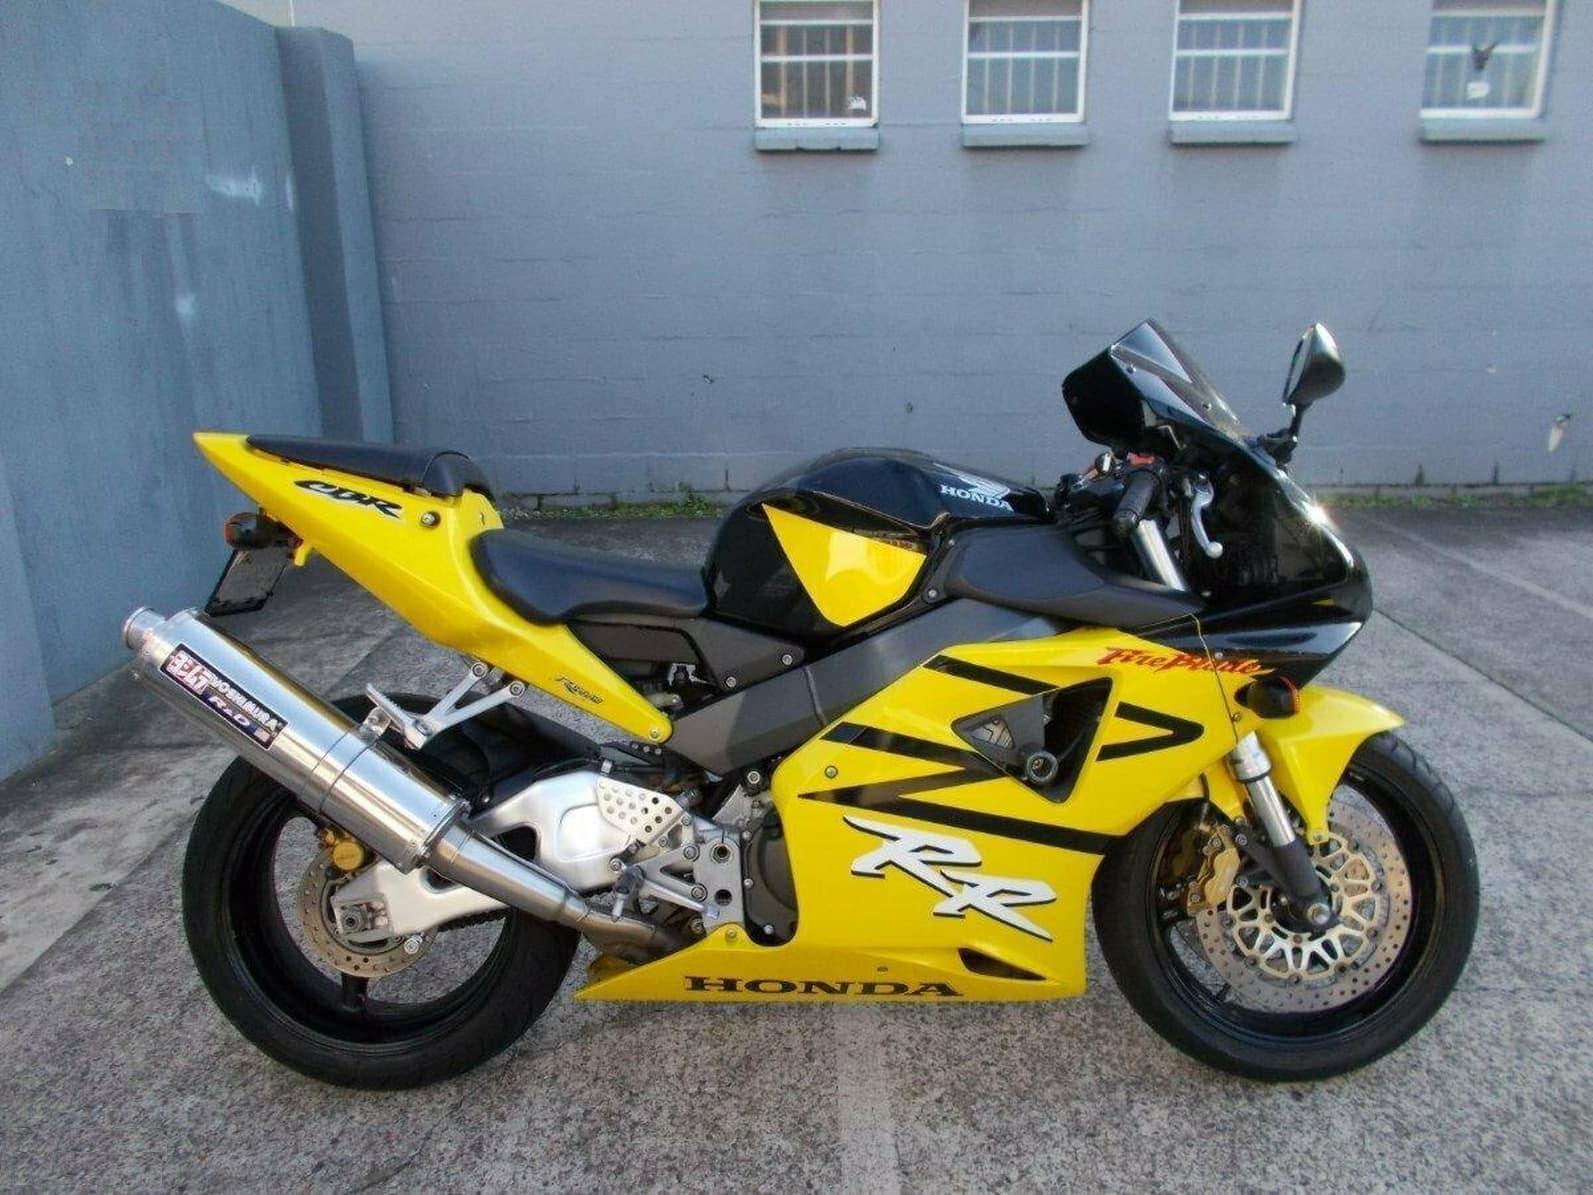 Yellow and Black Honda CBR954RR FireBlade from Gold Coast Honda